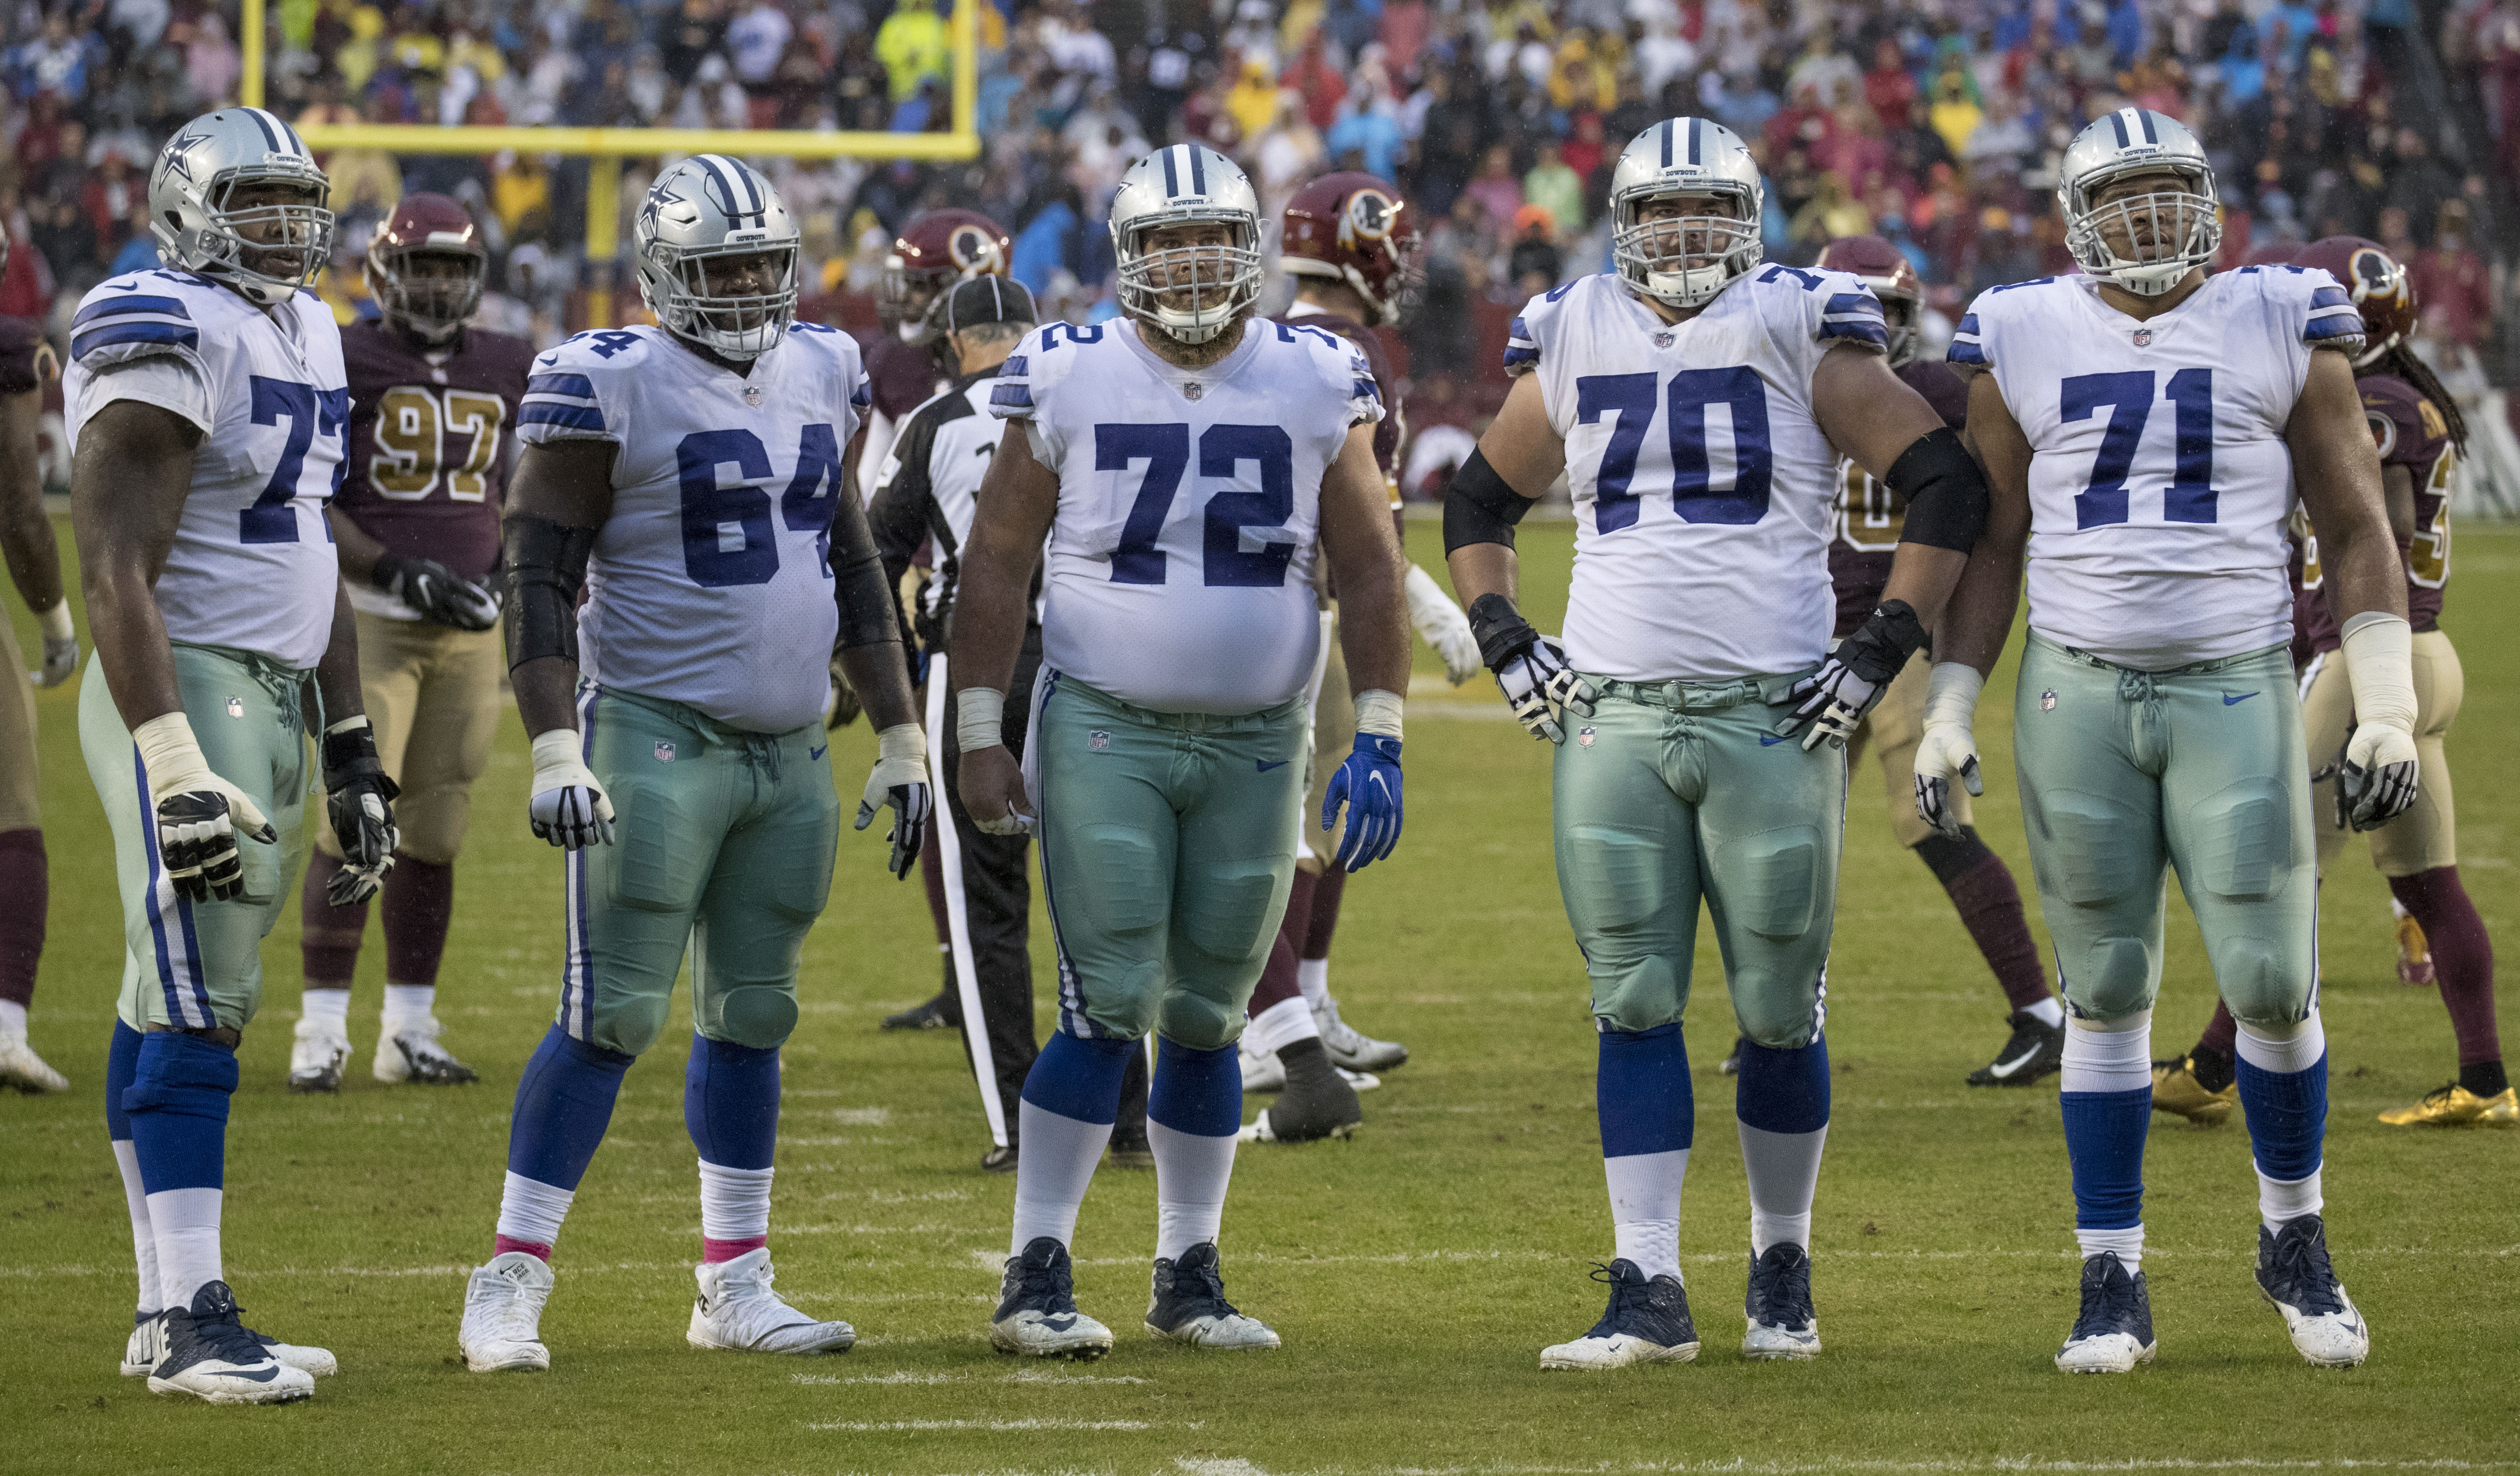 Dallas Cowboys offensive line vs Washington Redskins in October 2017.